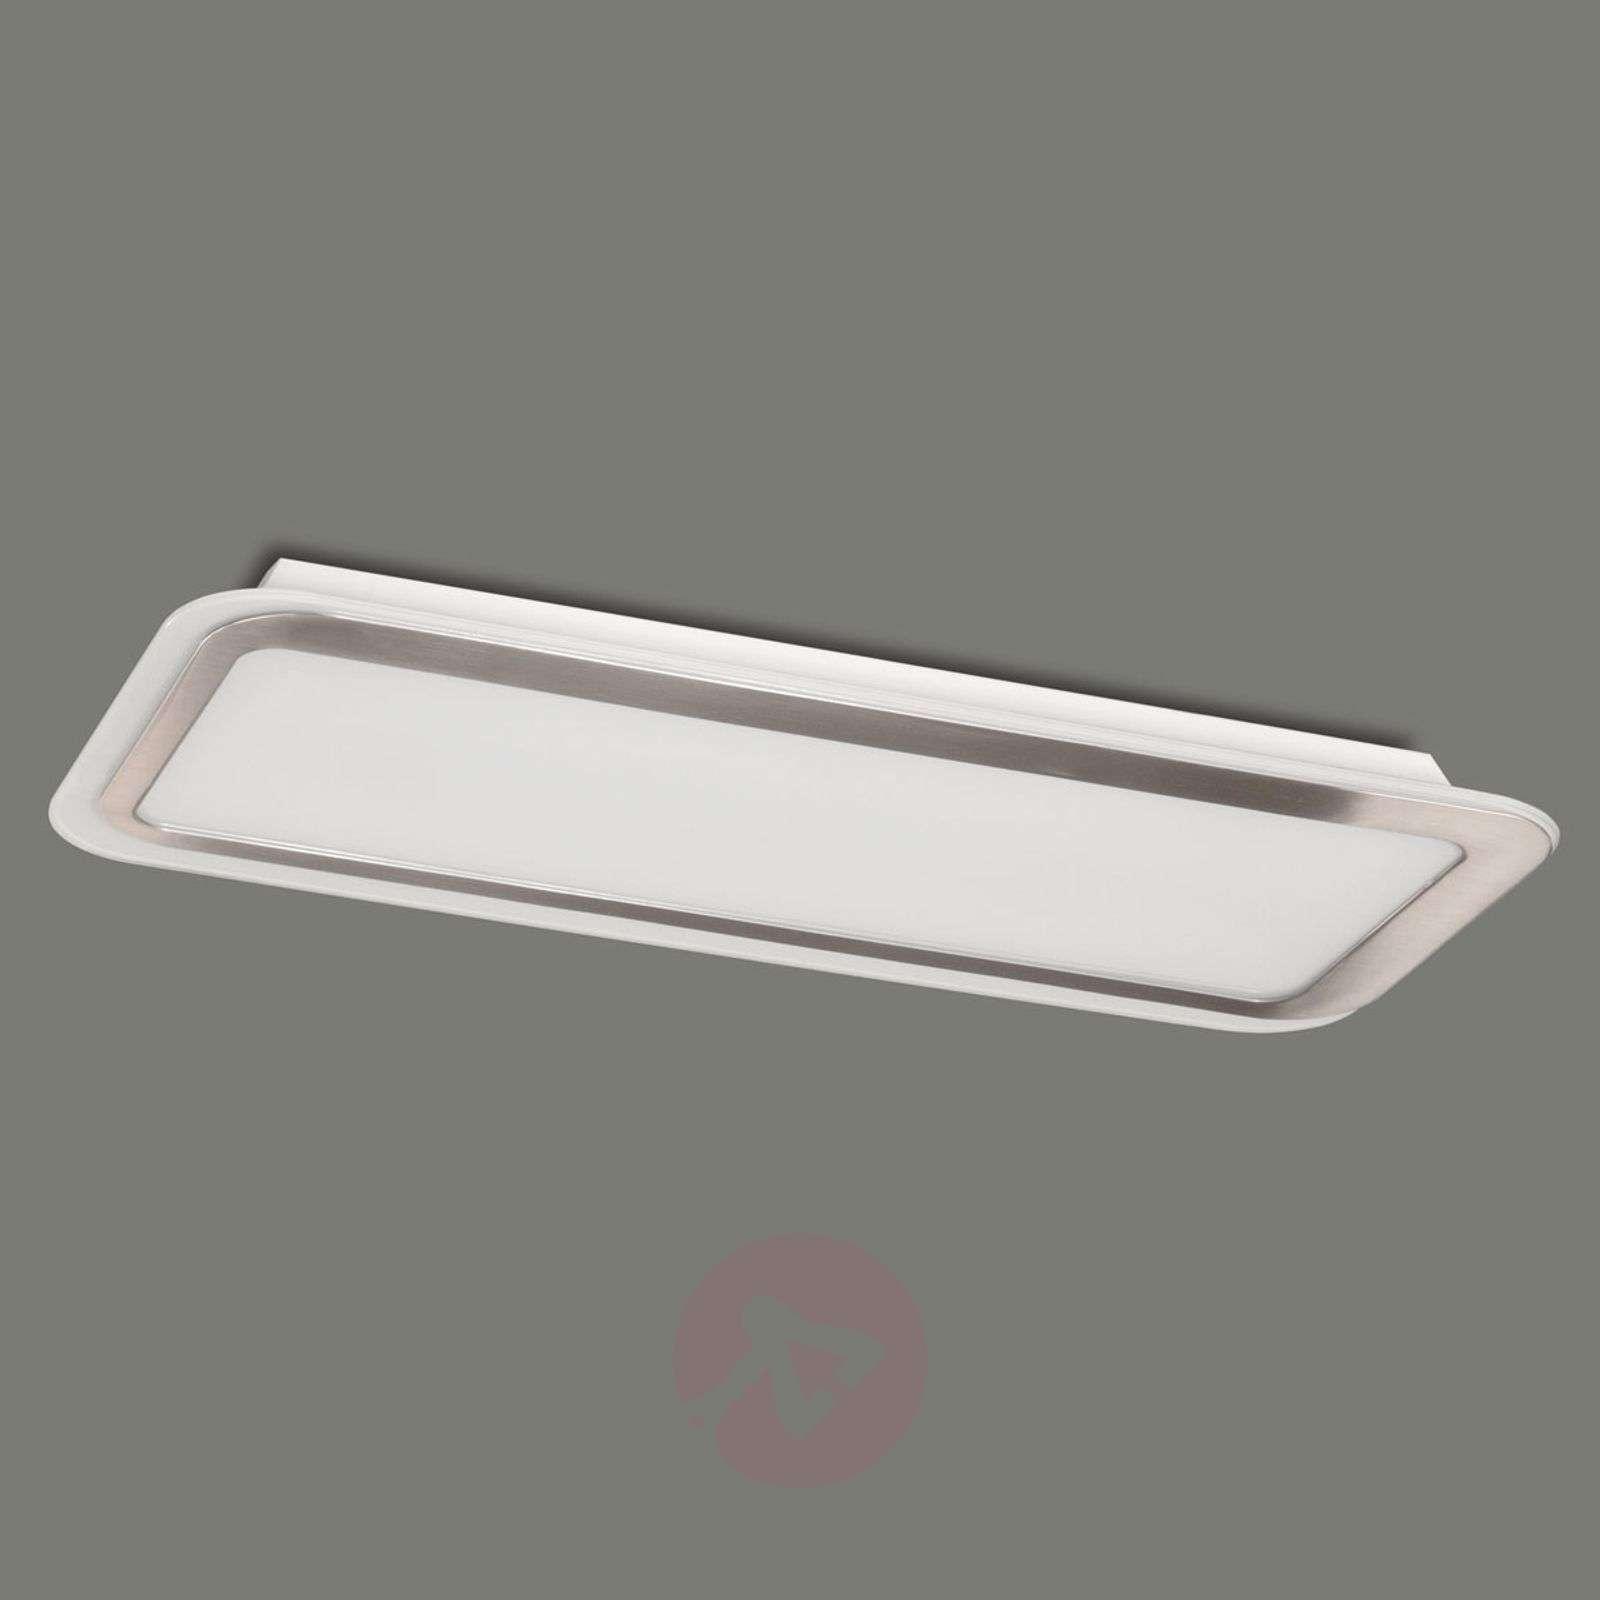 Glogg-ceiling light 63.7 cm-1050076-01